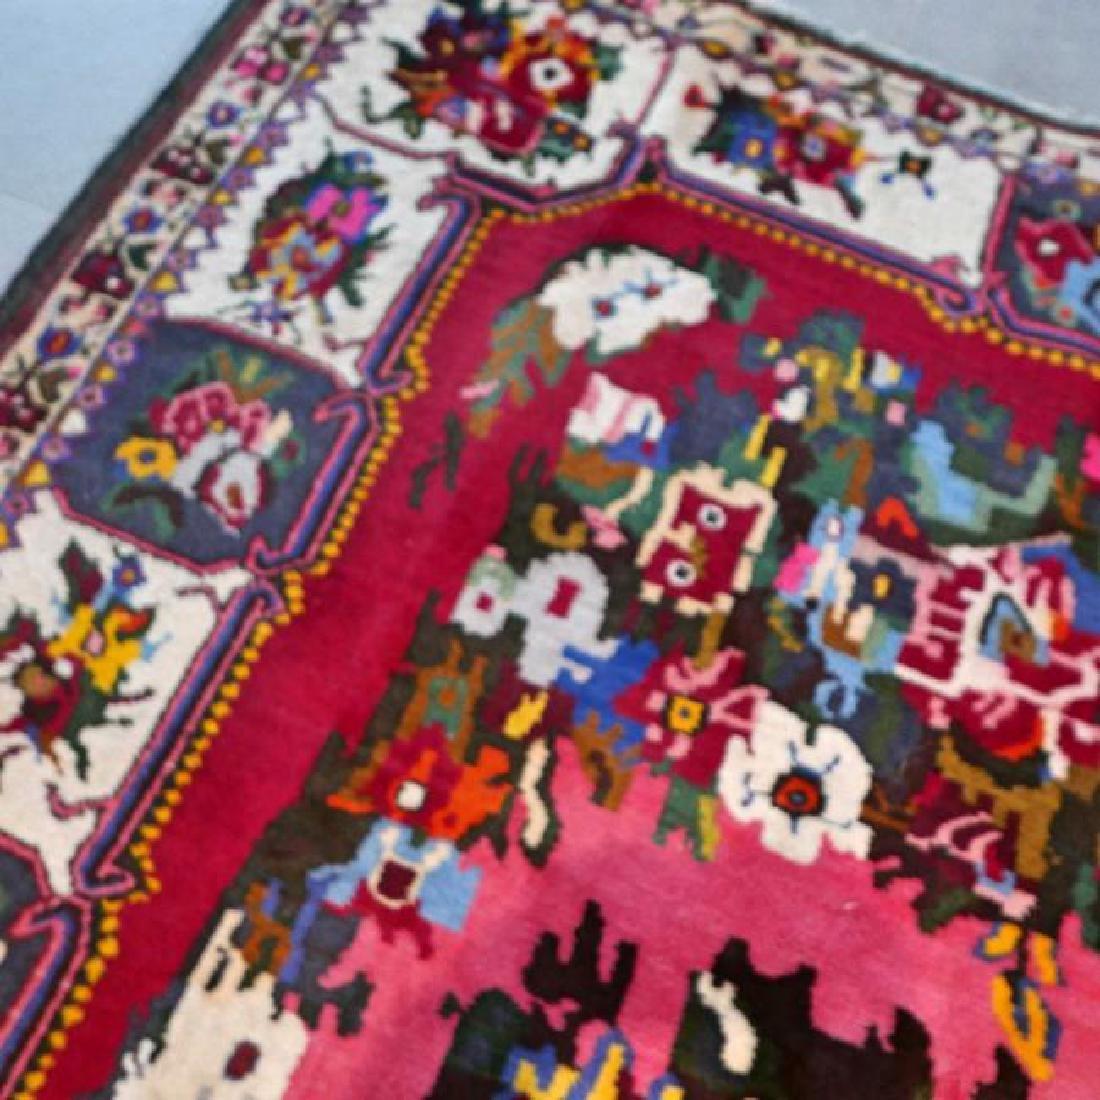 Special Flower Design Bakhtiar Semi Antique Rug 8.1x5.6 - 6